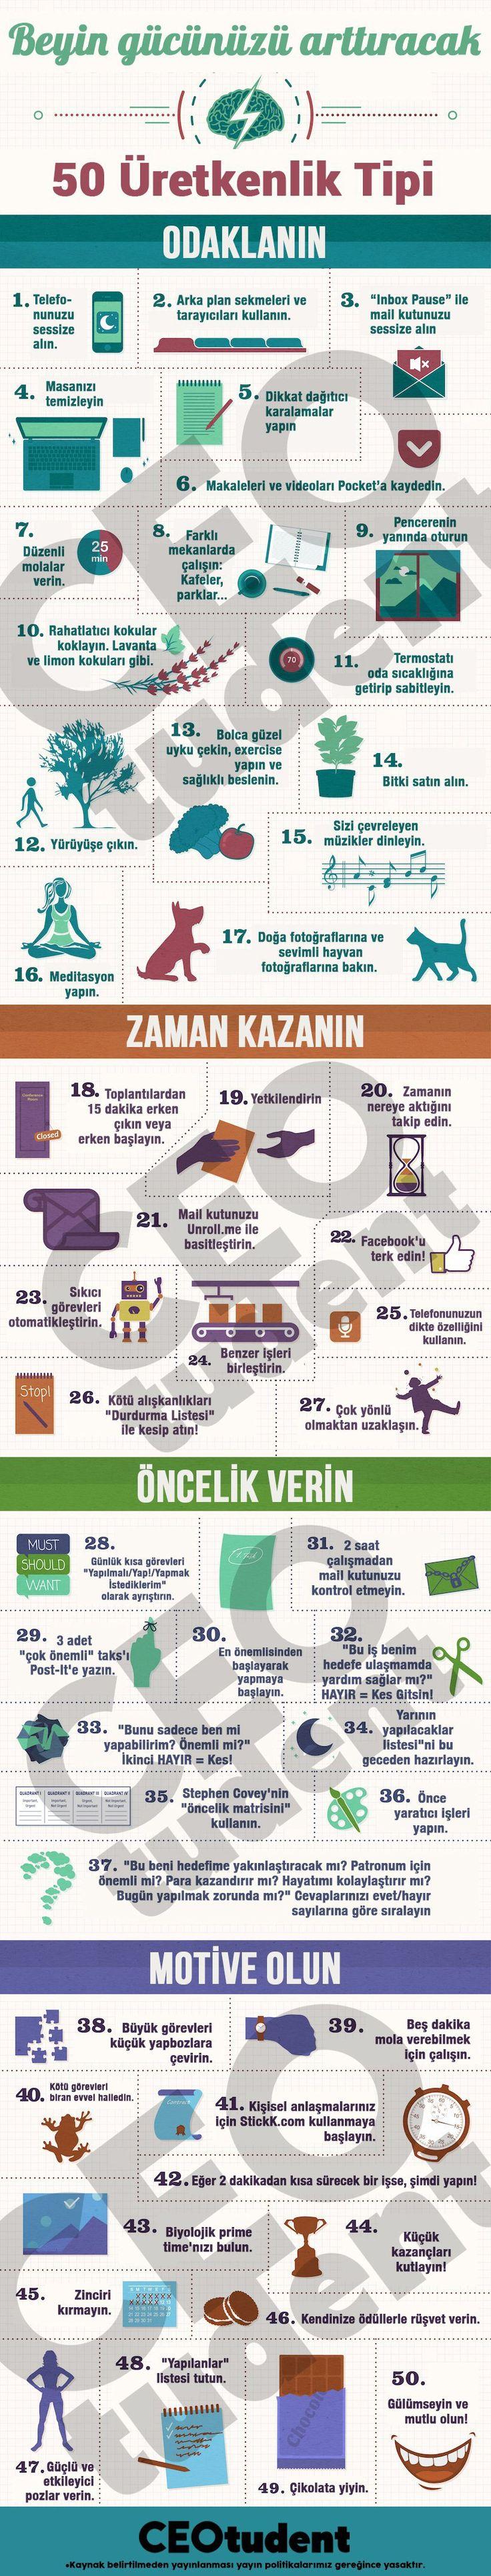 http://www.ceotudent.com/beyin-gucunuzu-arttiran-50-tip-uretkenlik-anahtari-infografik/